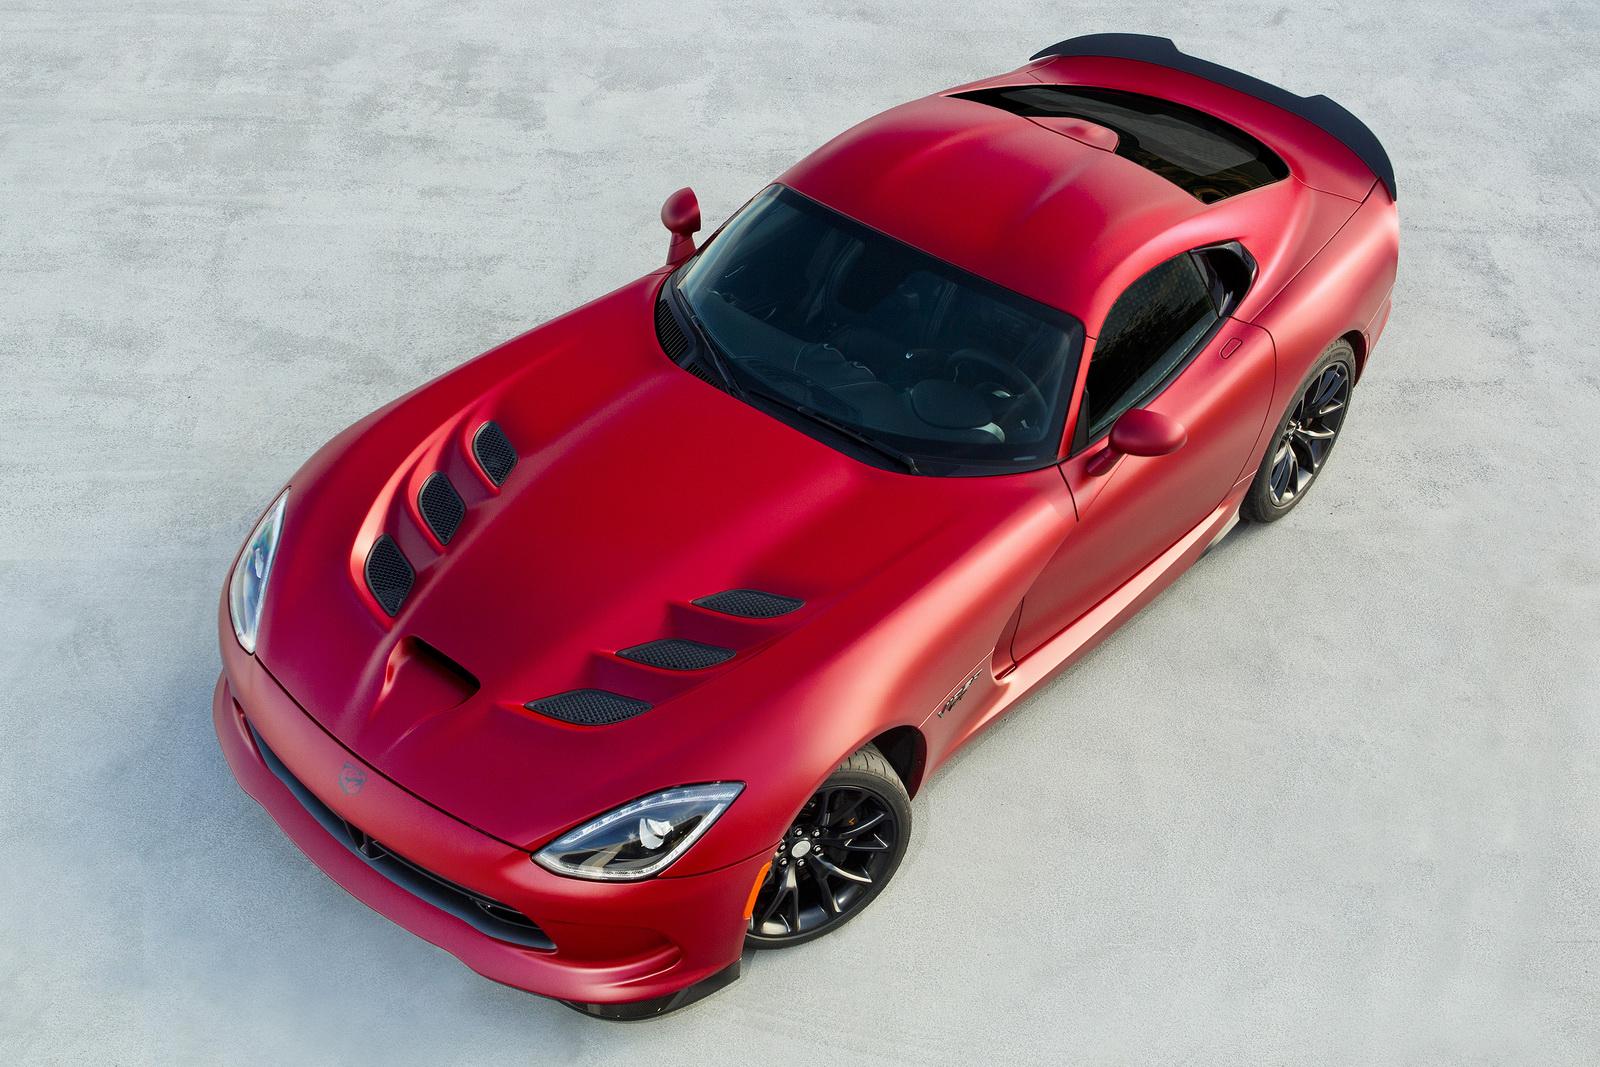 2015 Dodge Viper Srt Poses In New Matte Red Gtspirit